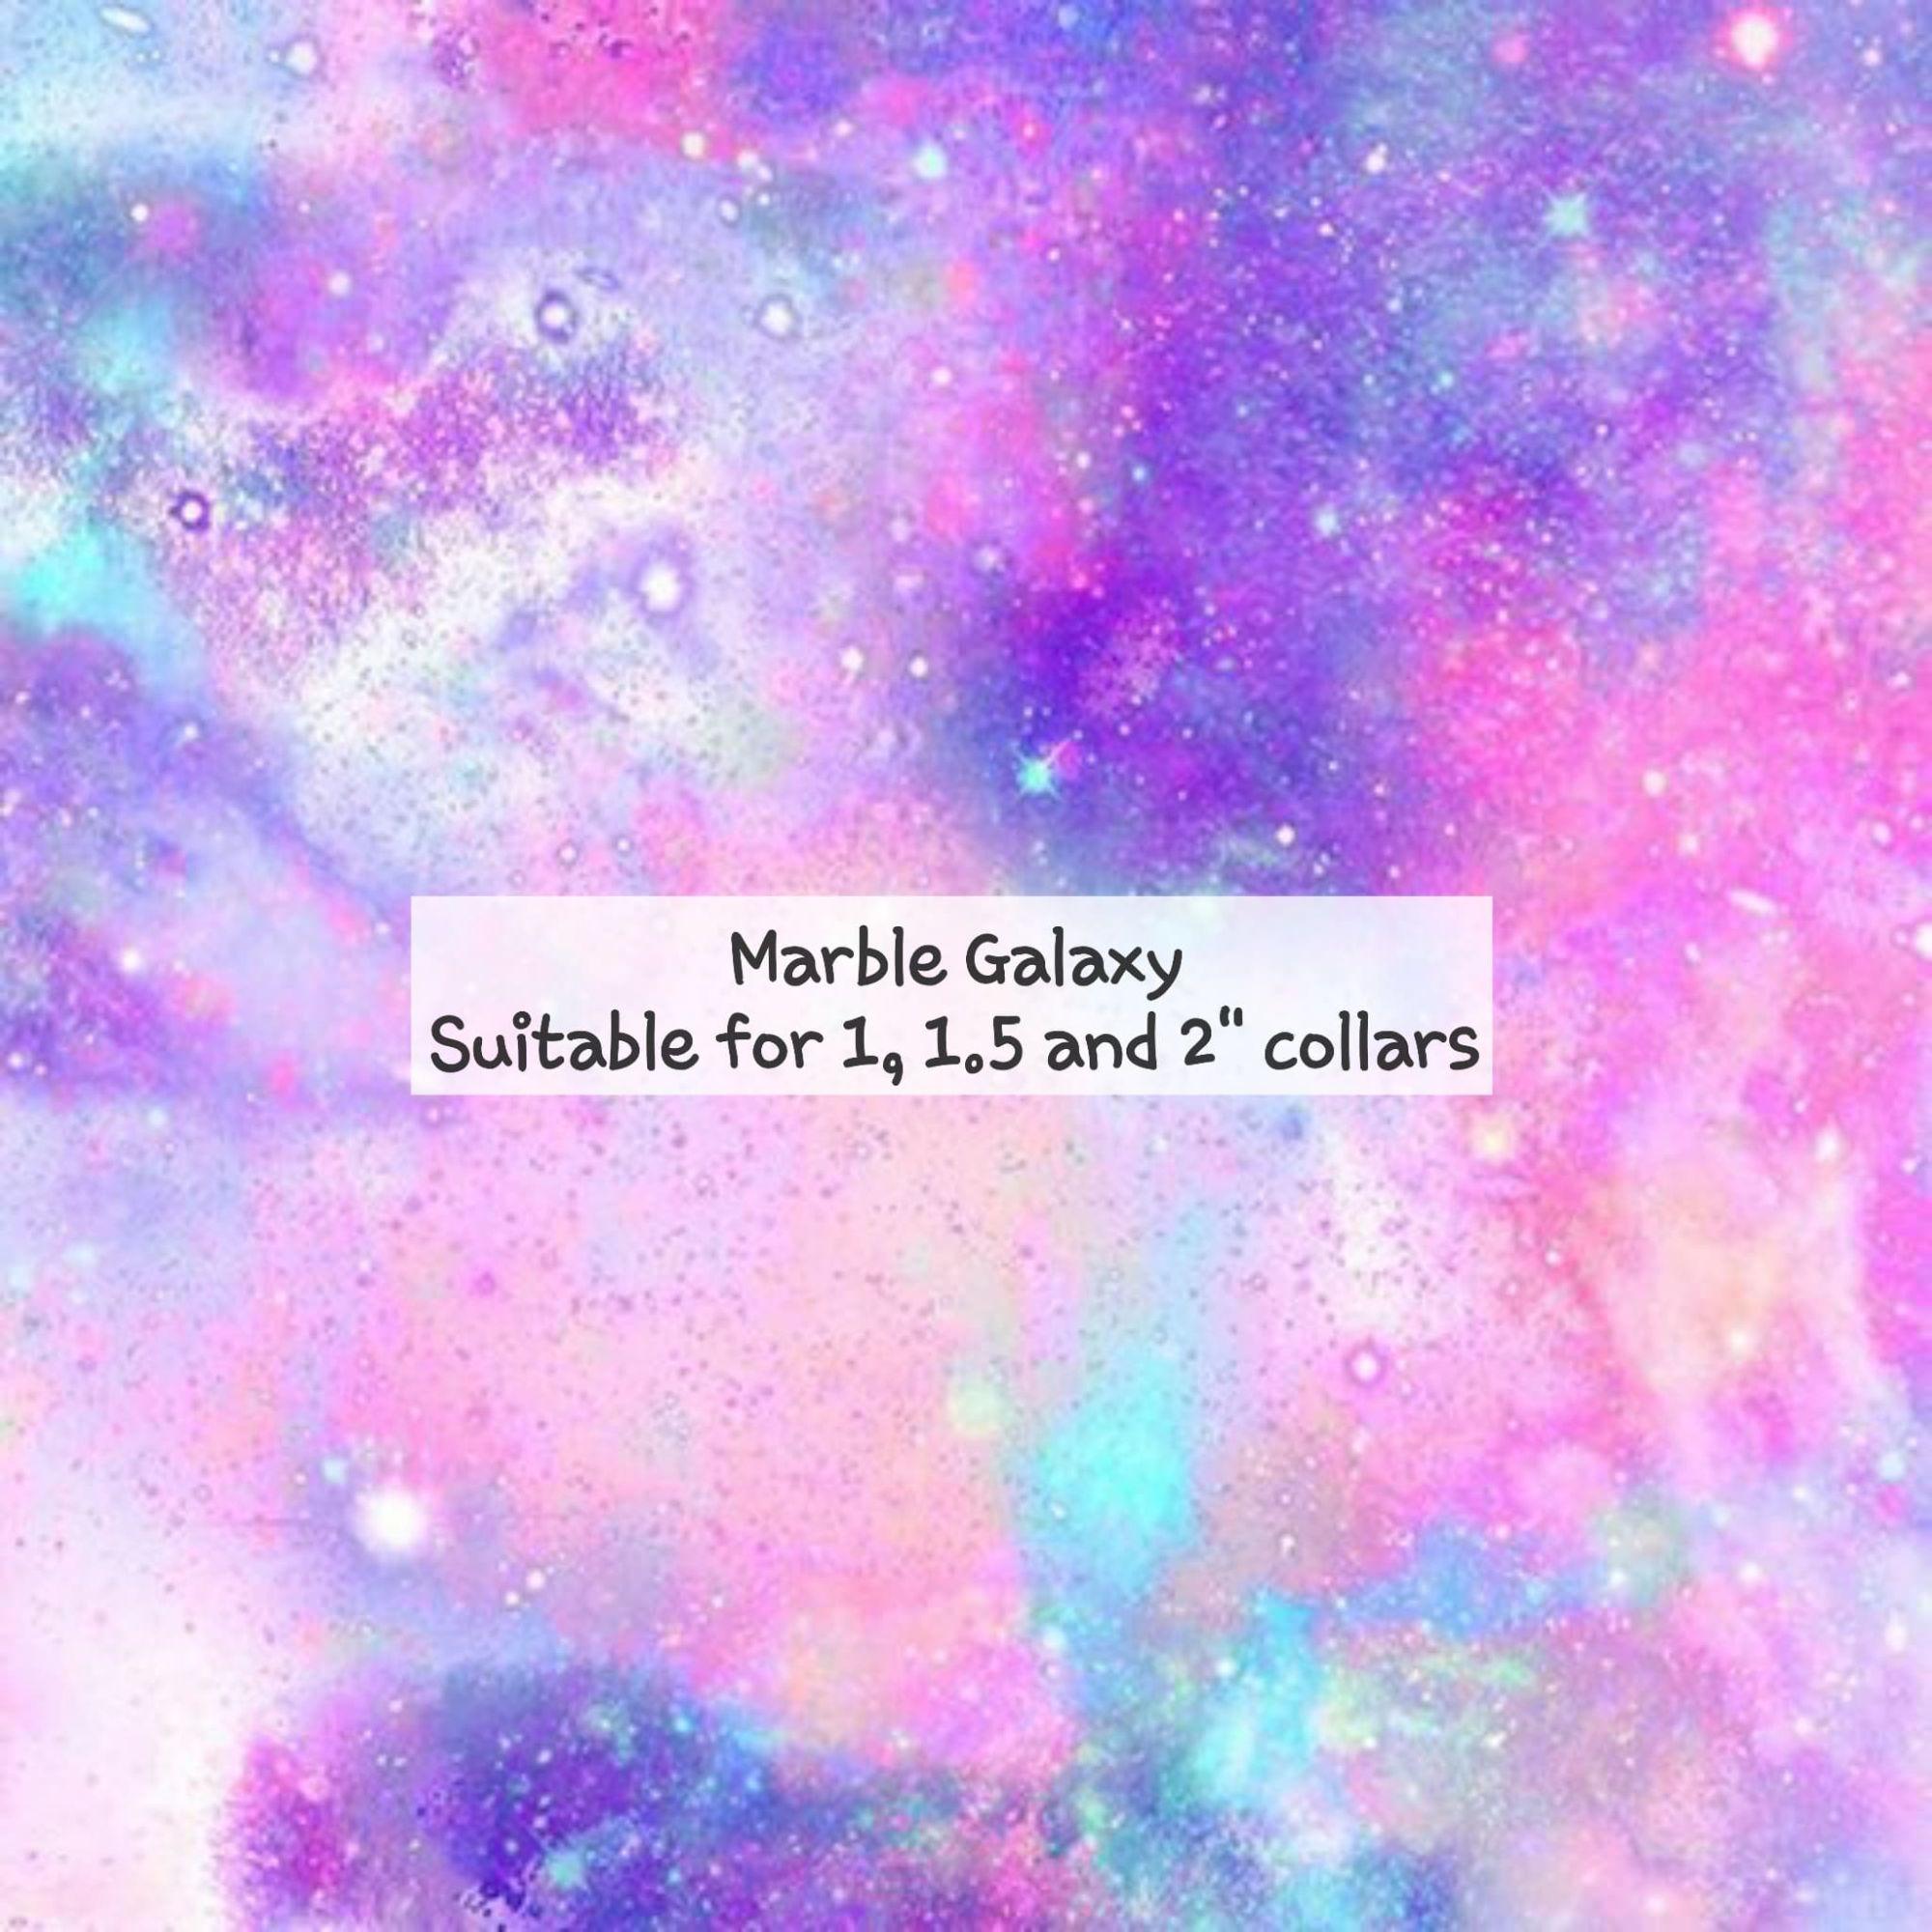 Marble Galaxy